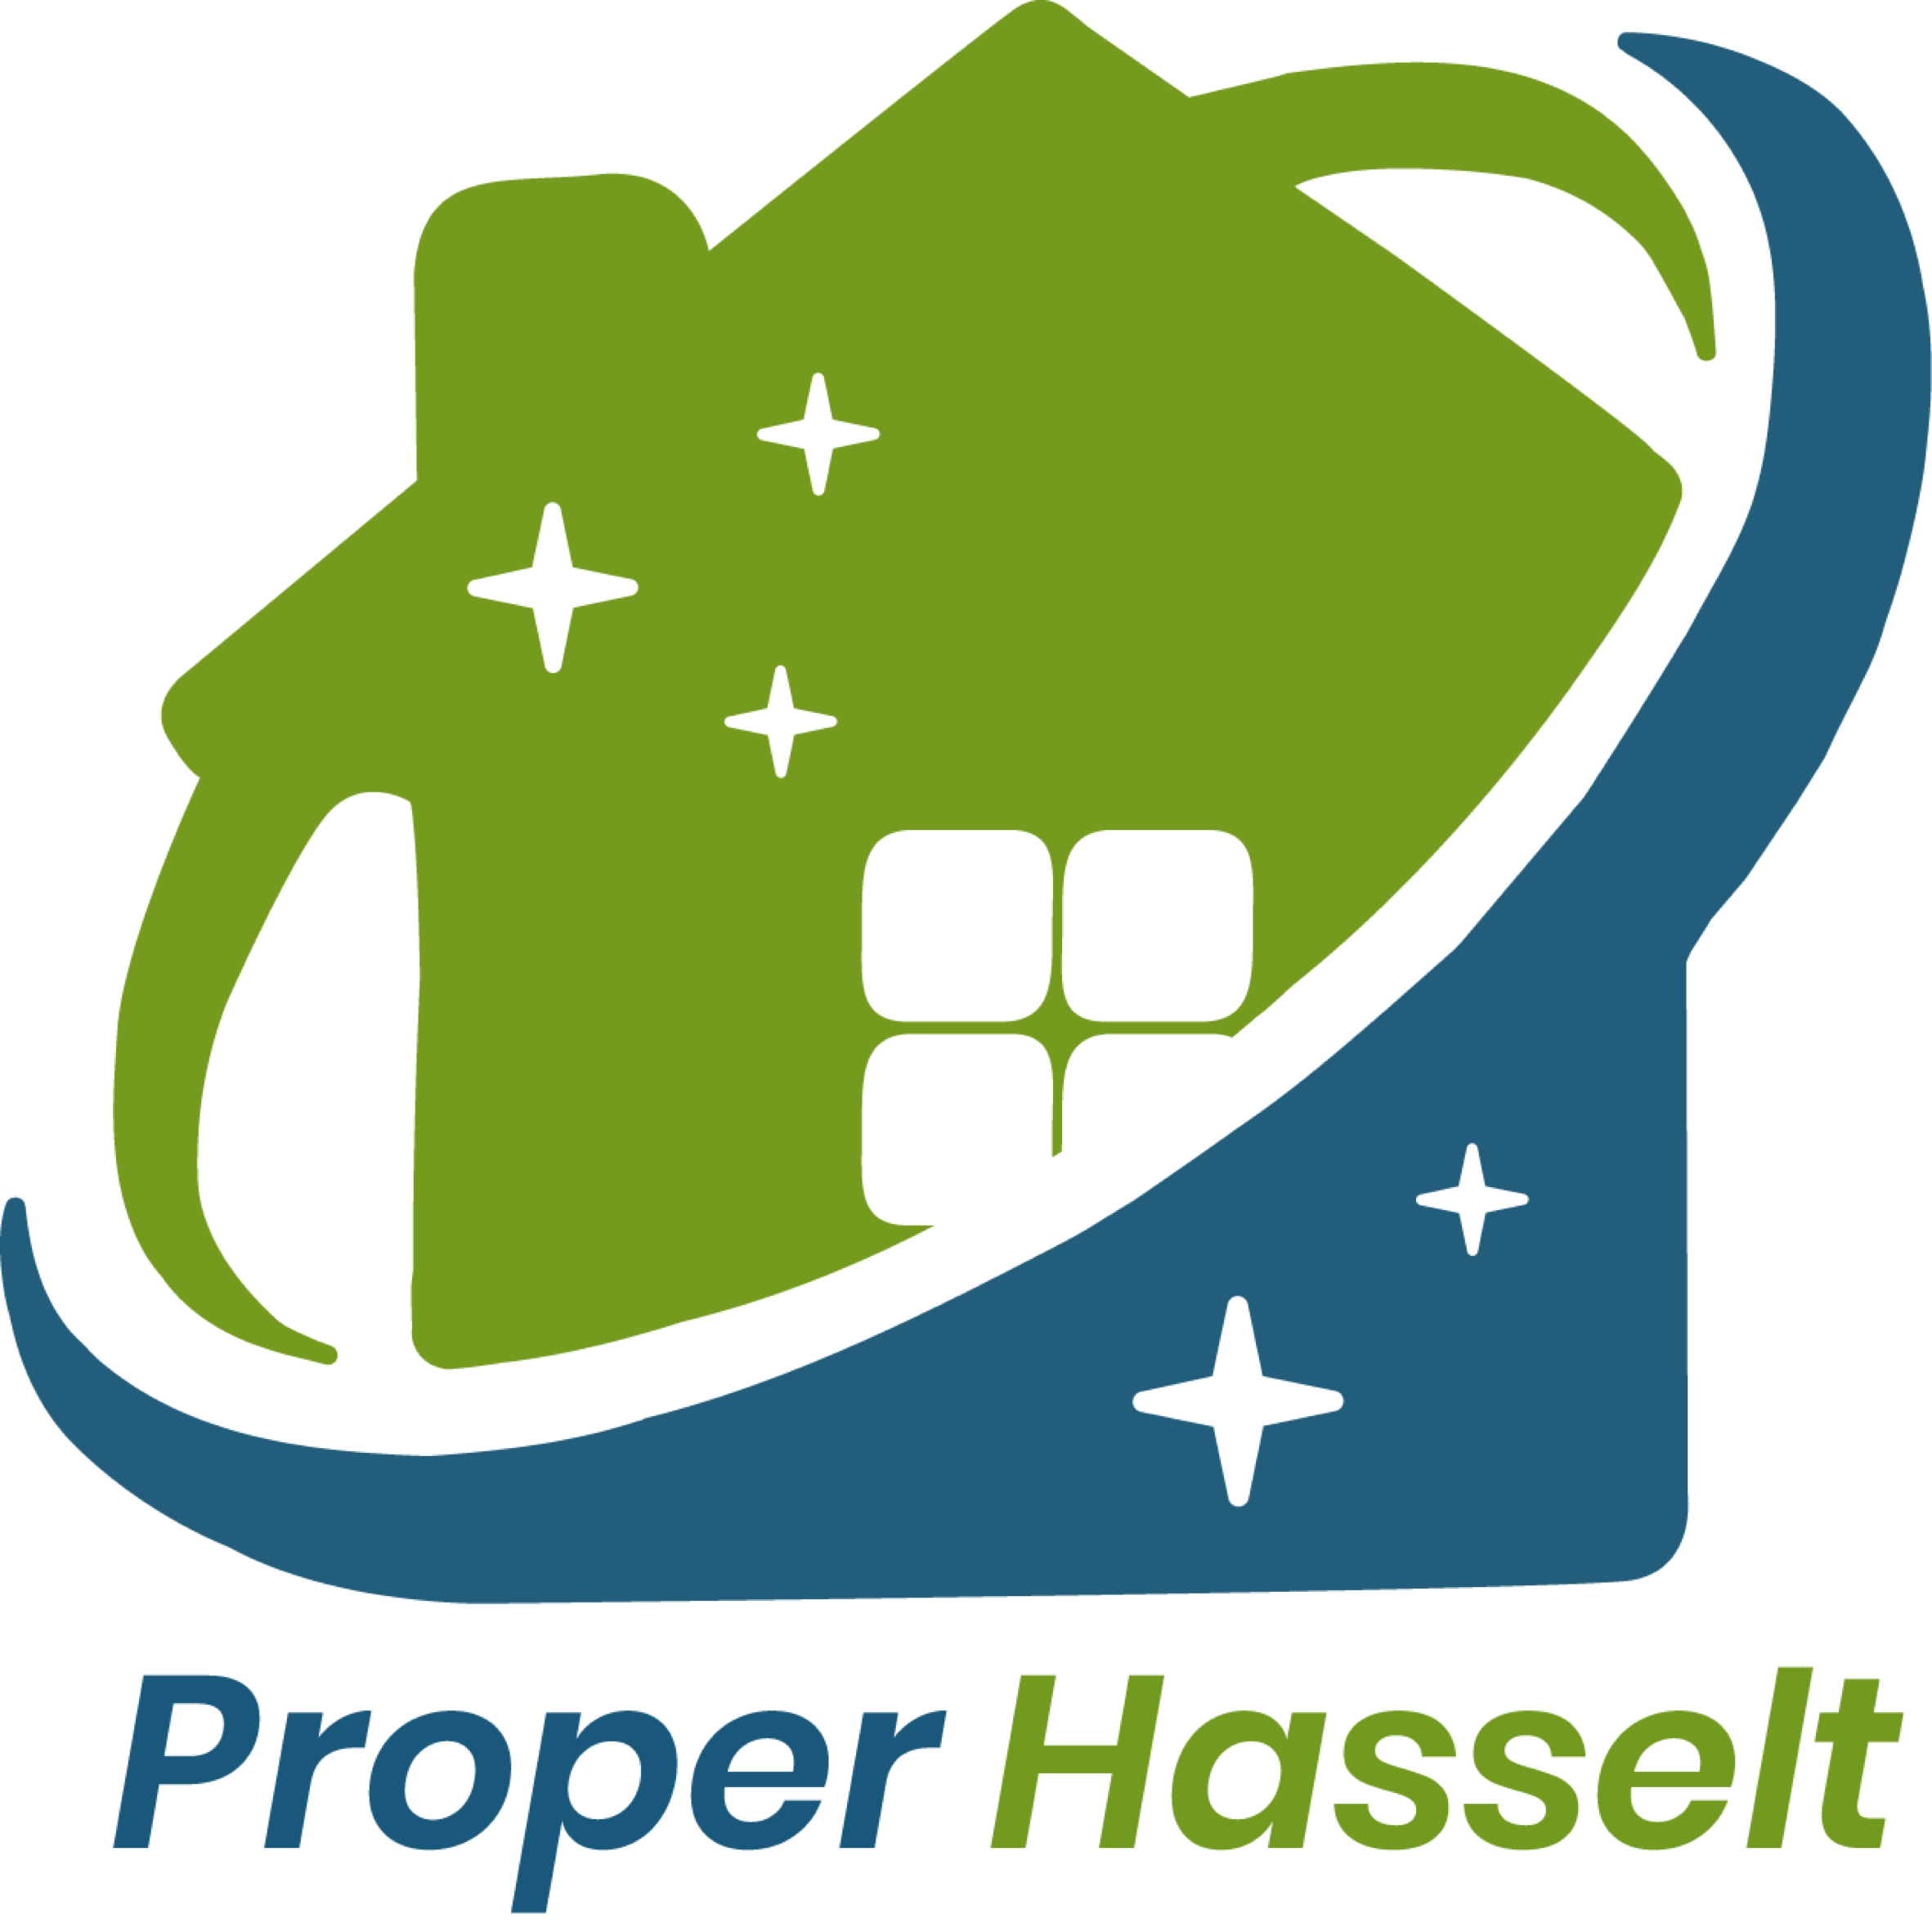 Proper Hasselt